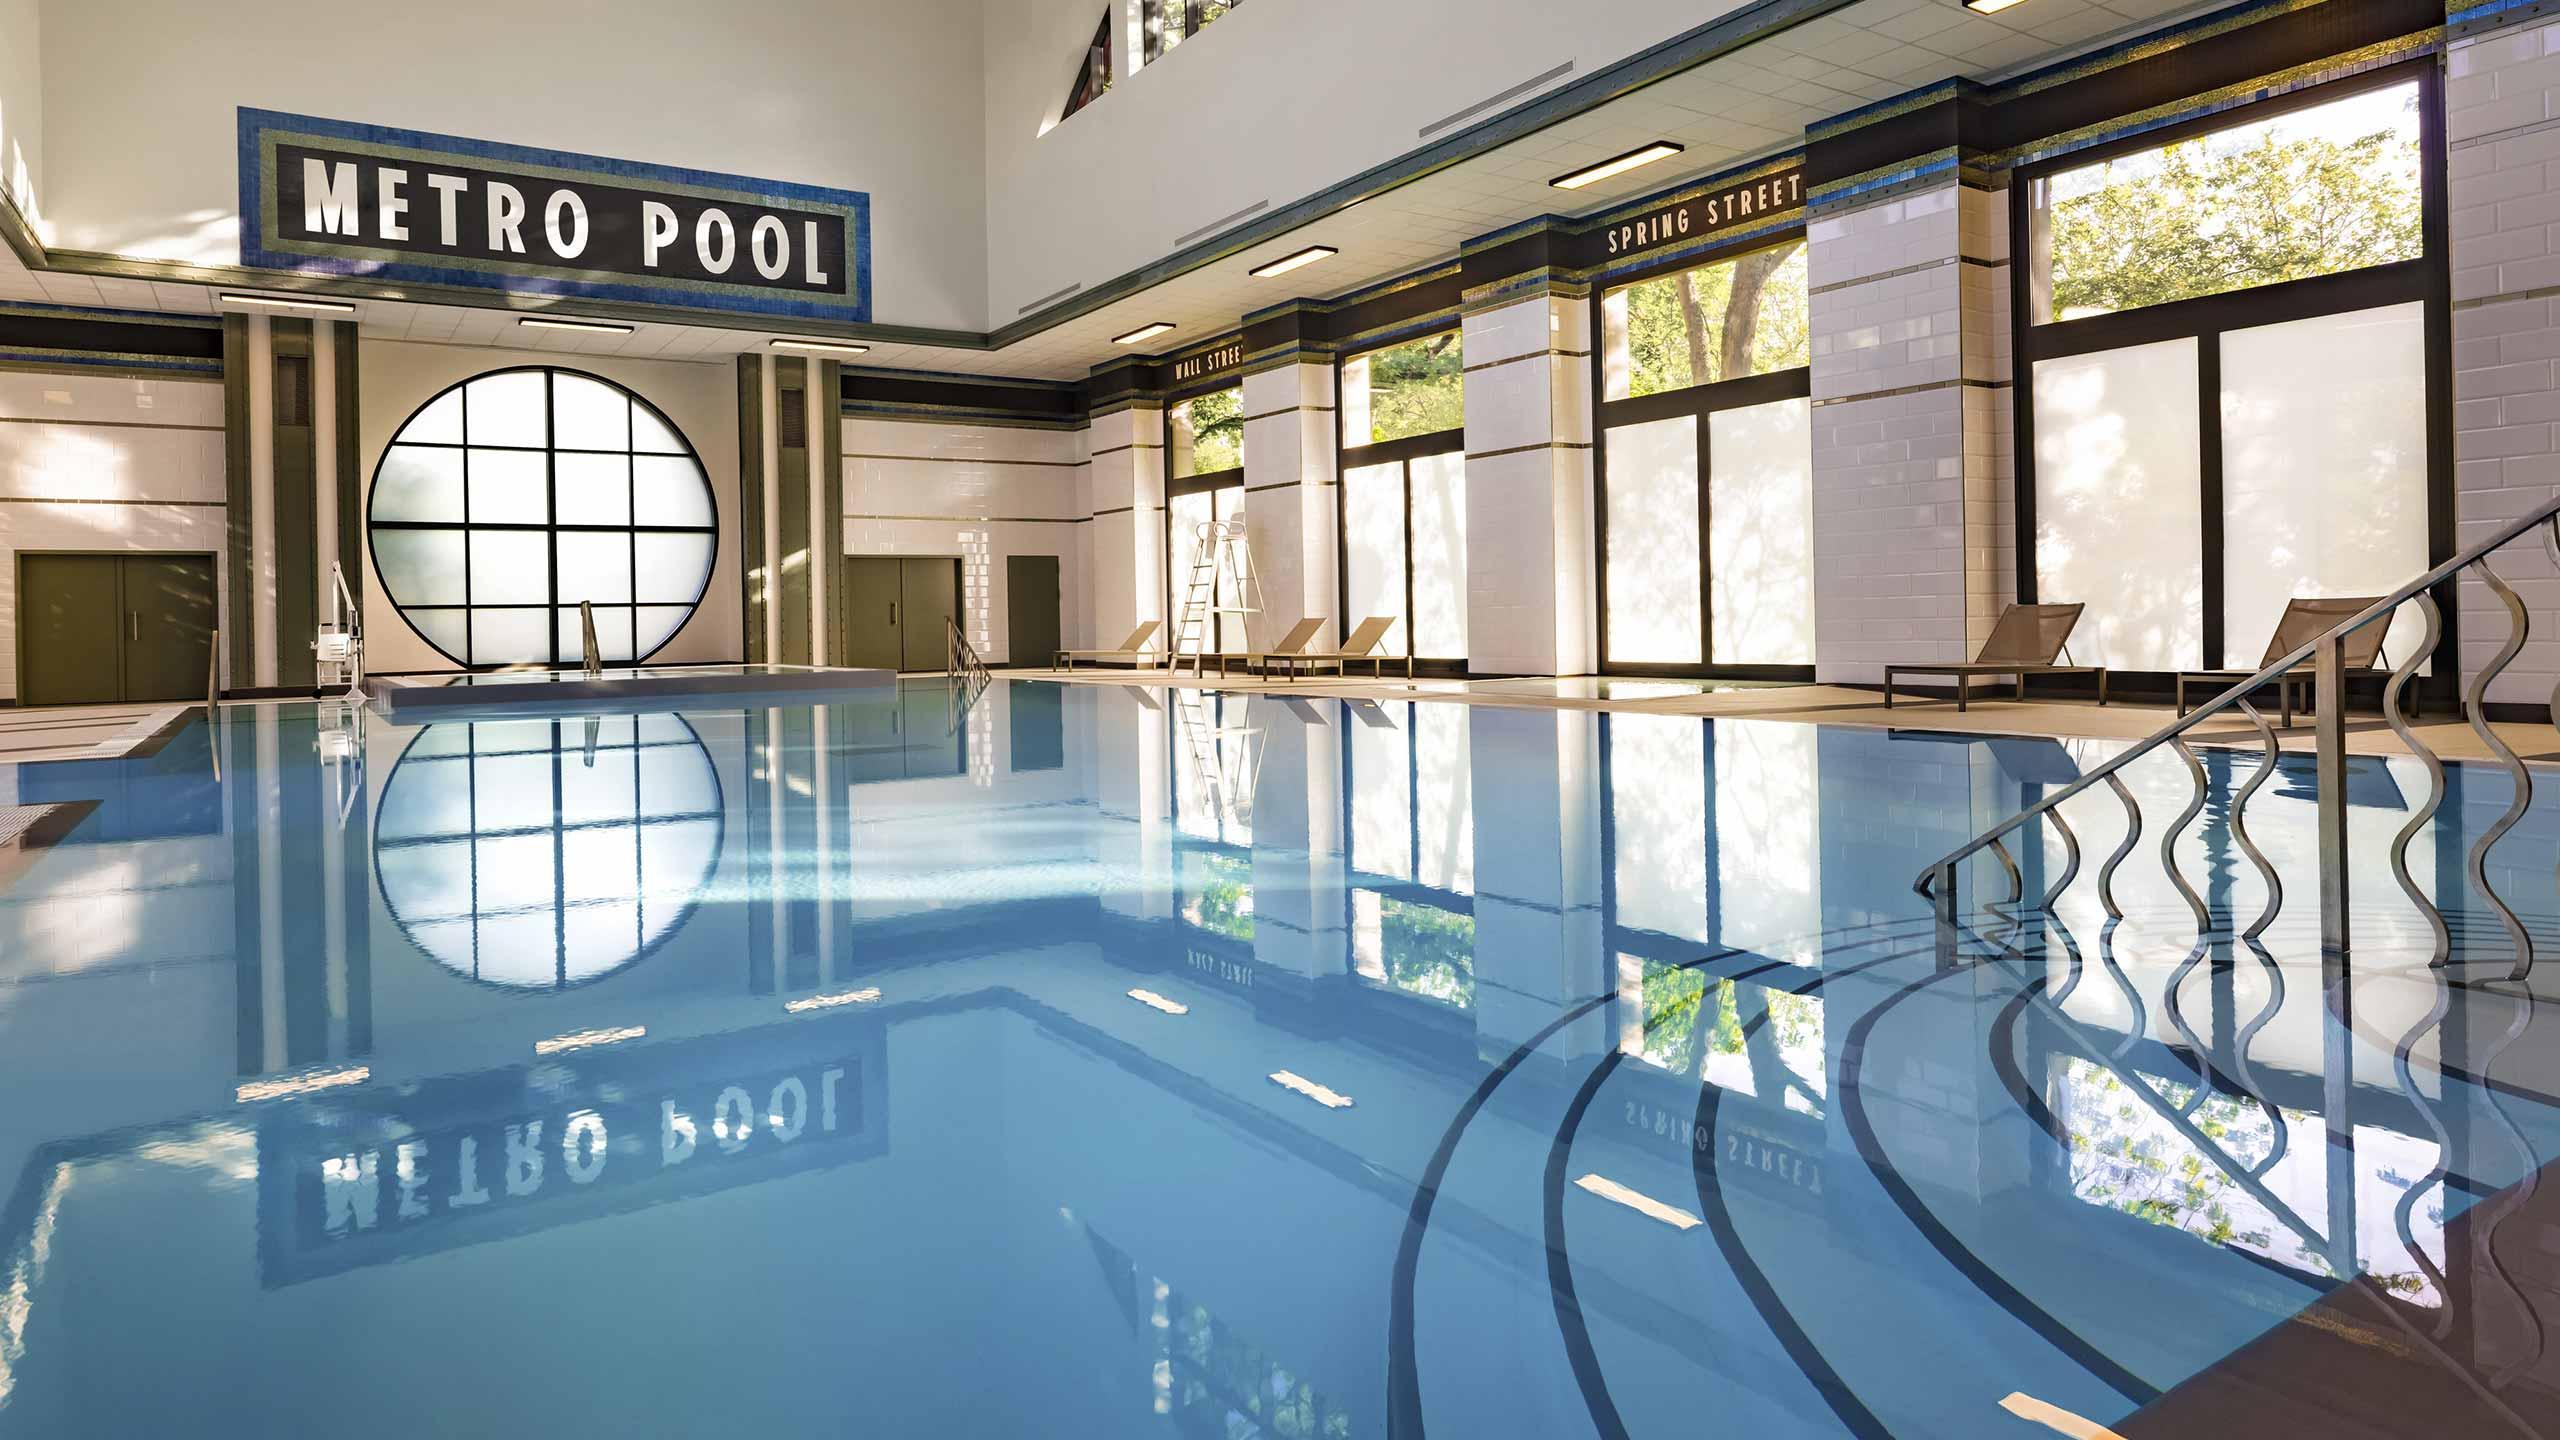 Gimnasio y piscina interior/exterior